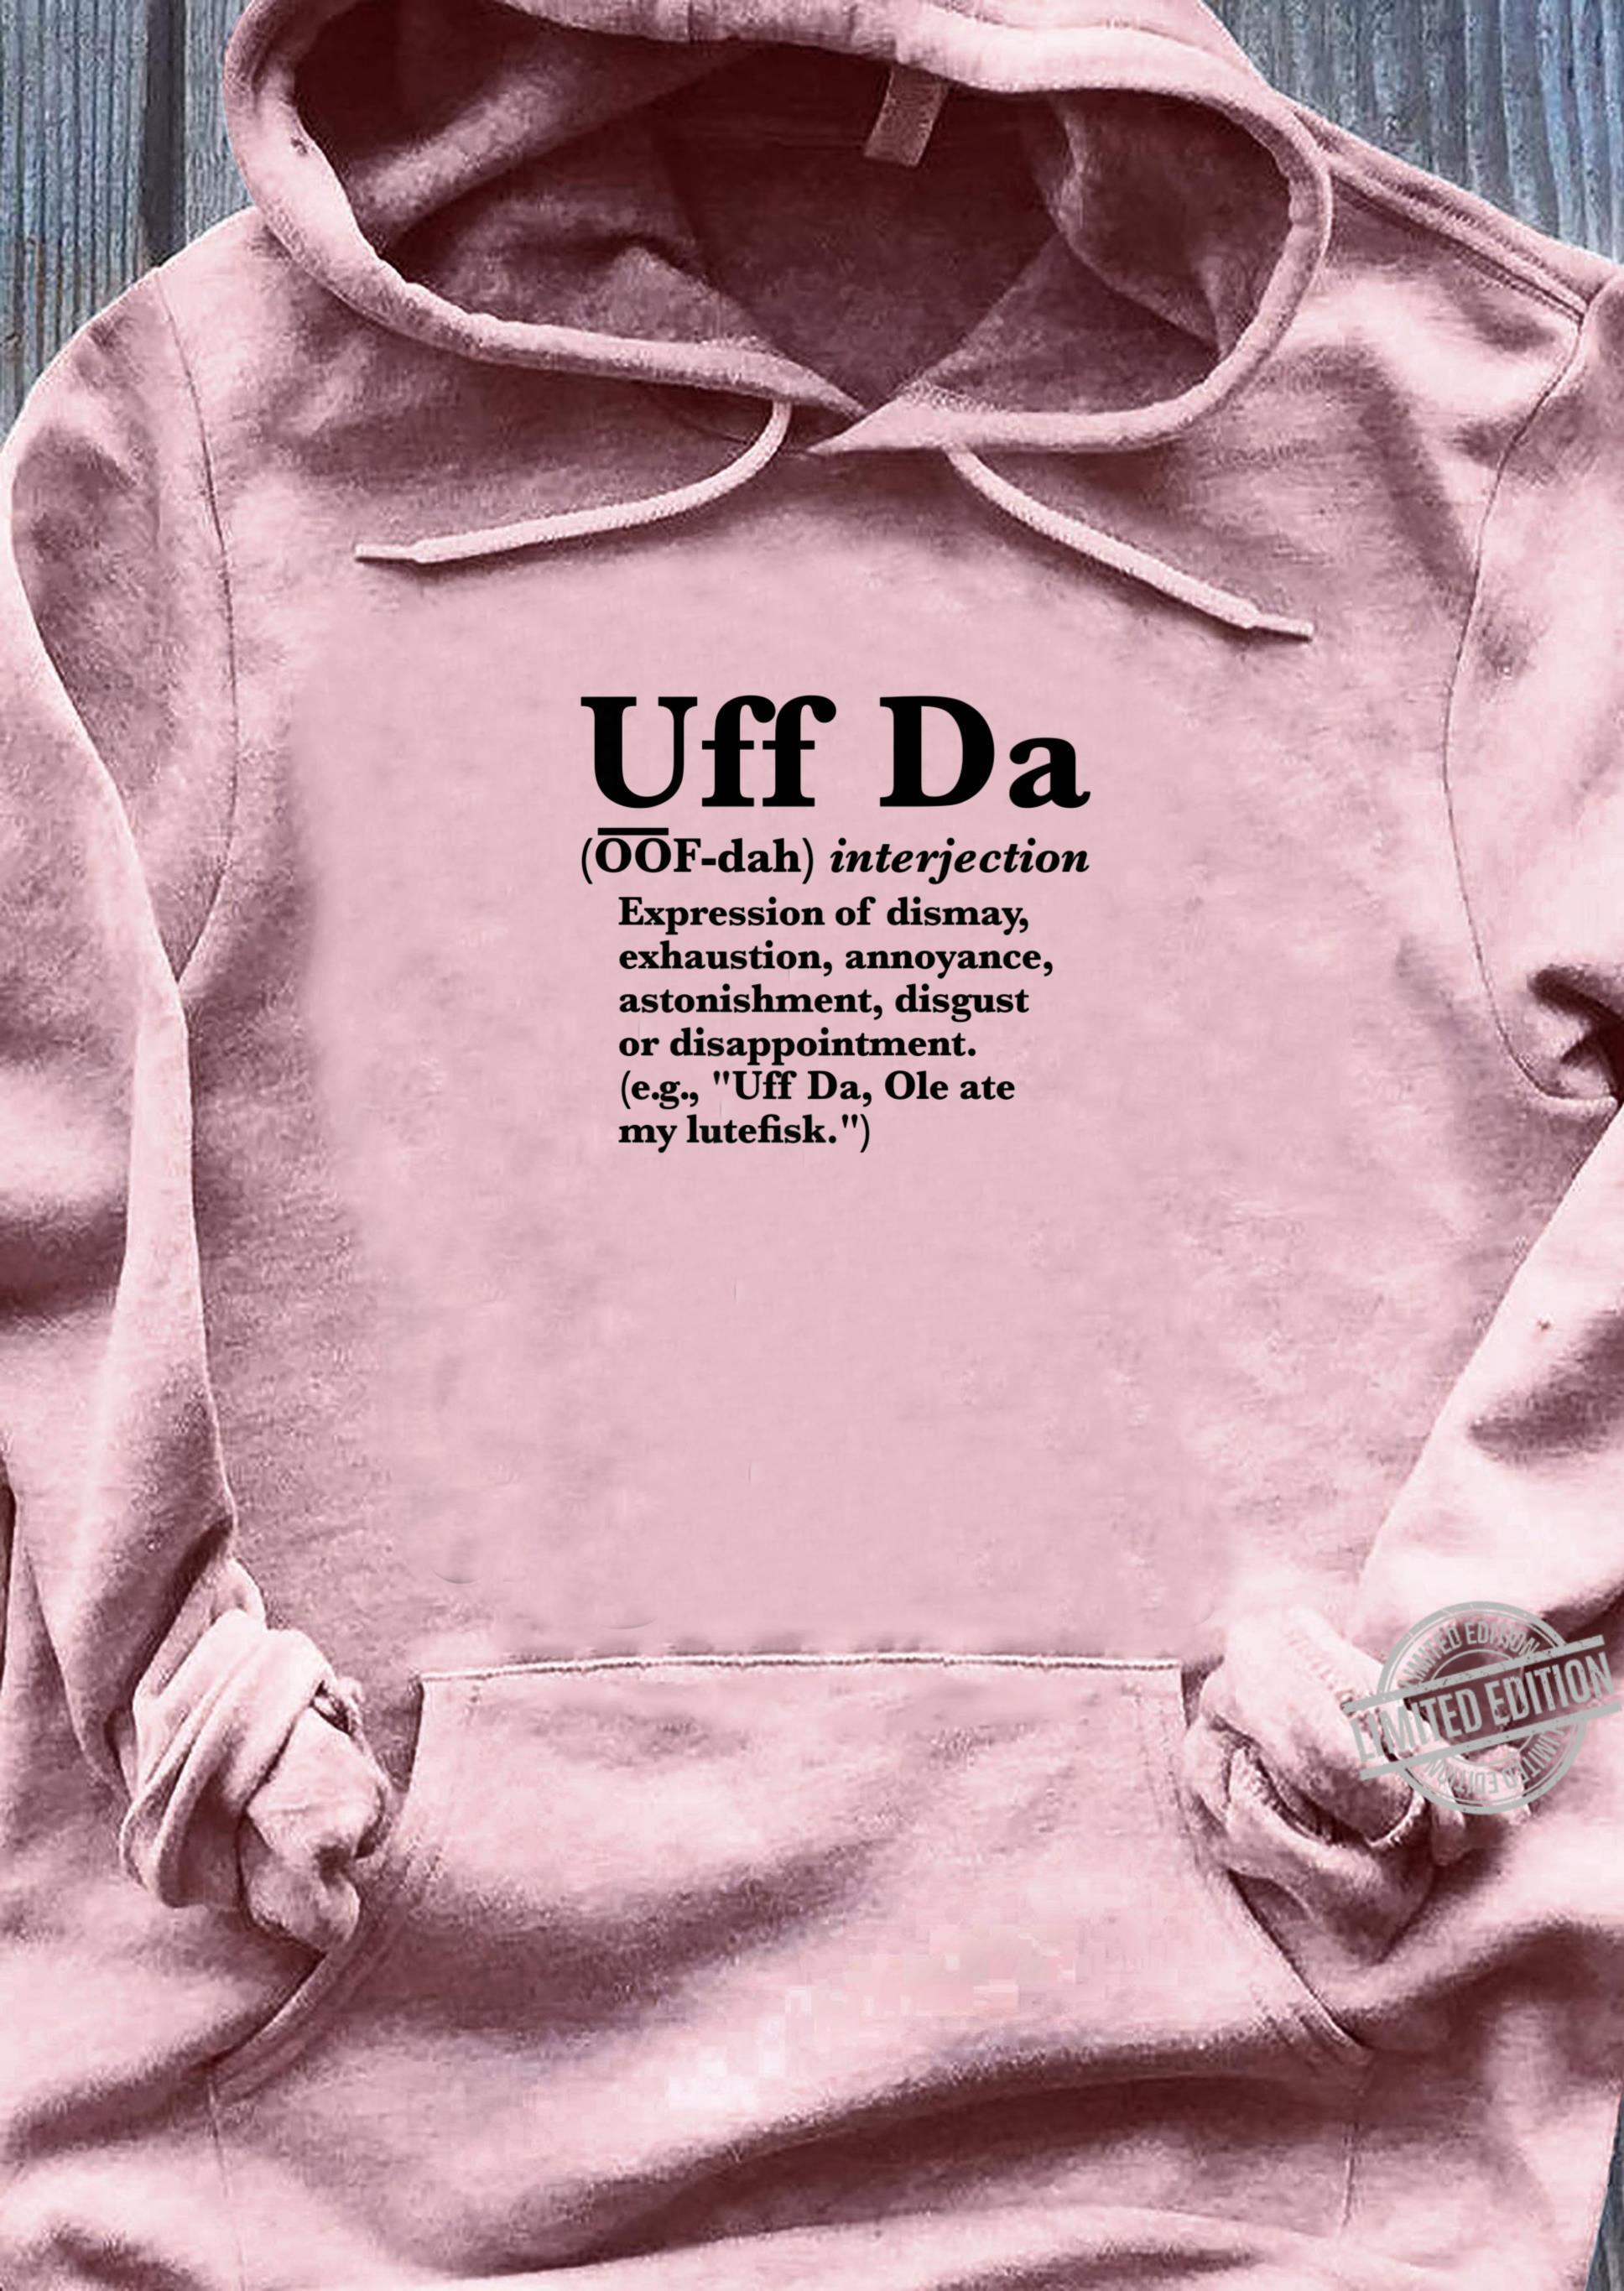 Uff Da Definition, Define Uff Da Shirt ladies tee